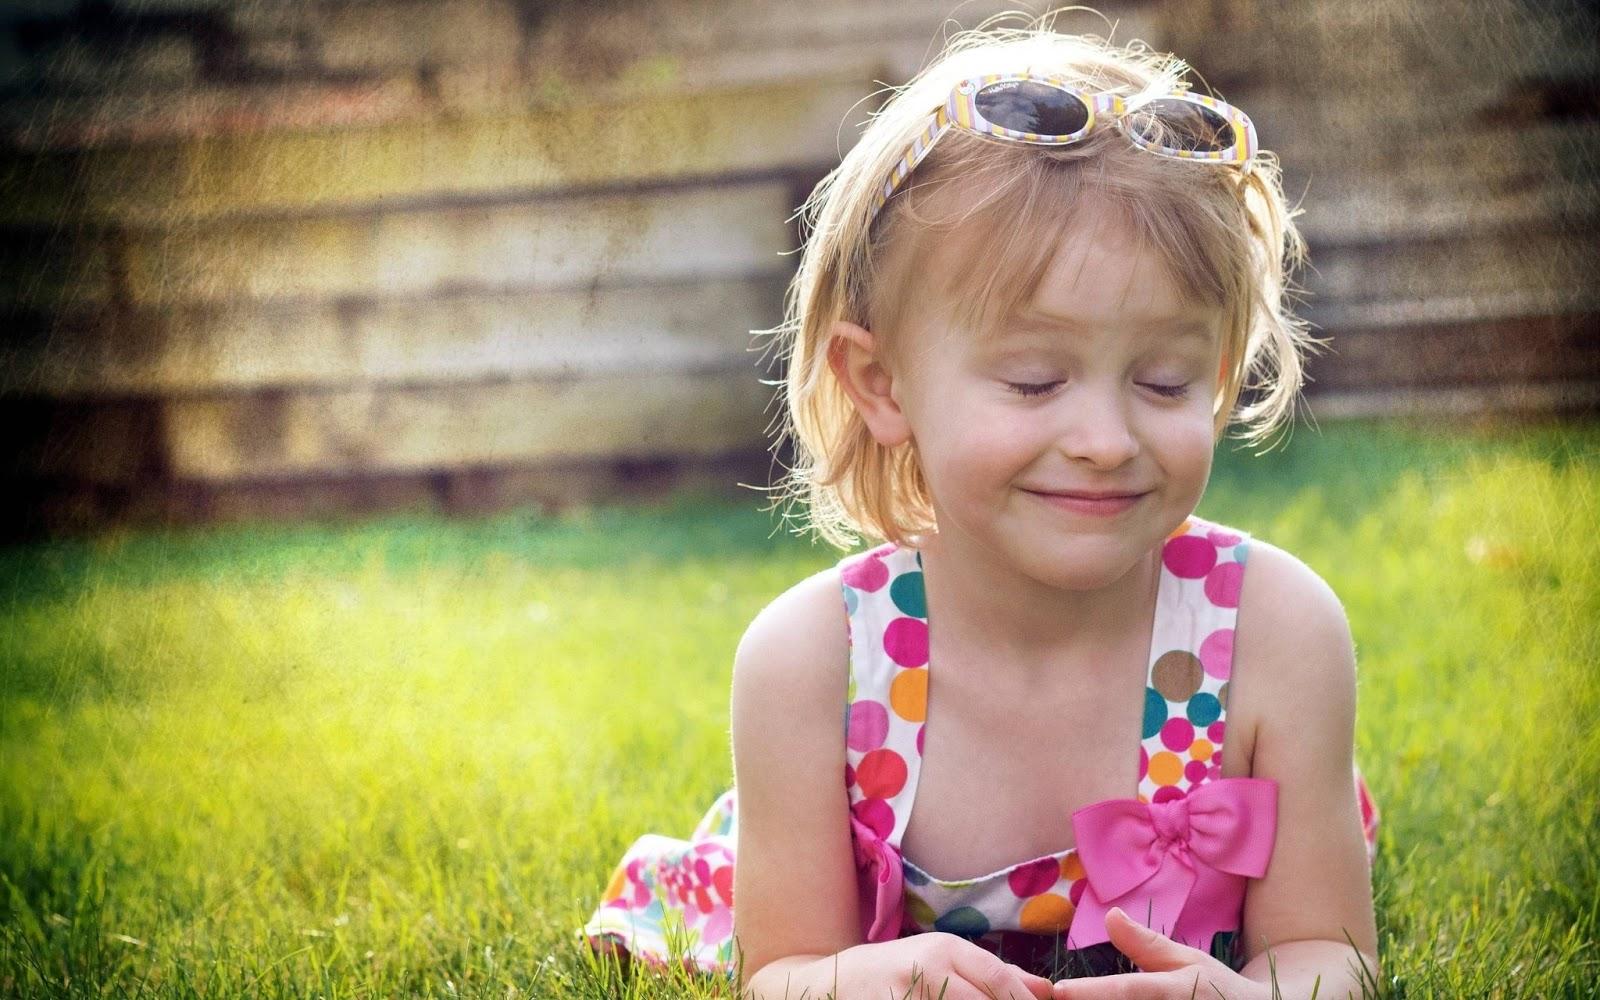 Windows 8 hd wallpapers windows 8 hd wallpapers of kids - Cute little girl pic hd ...